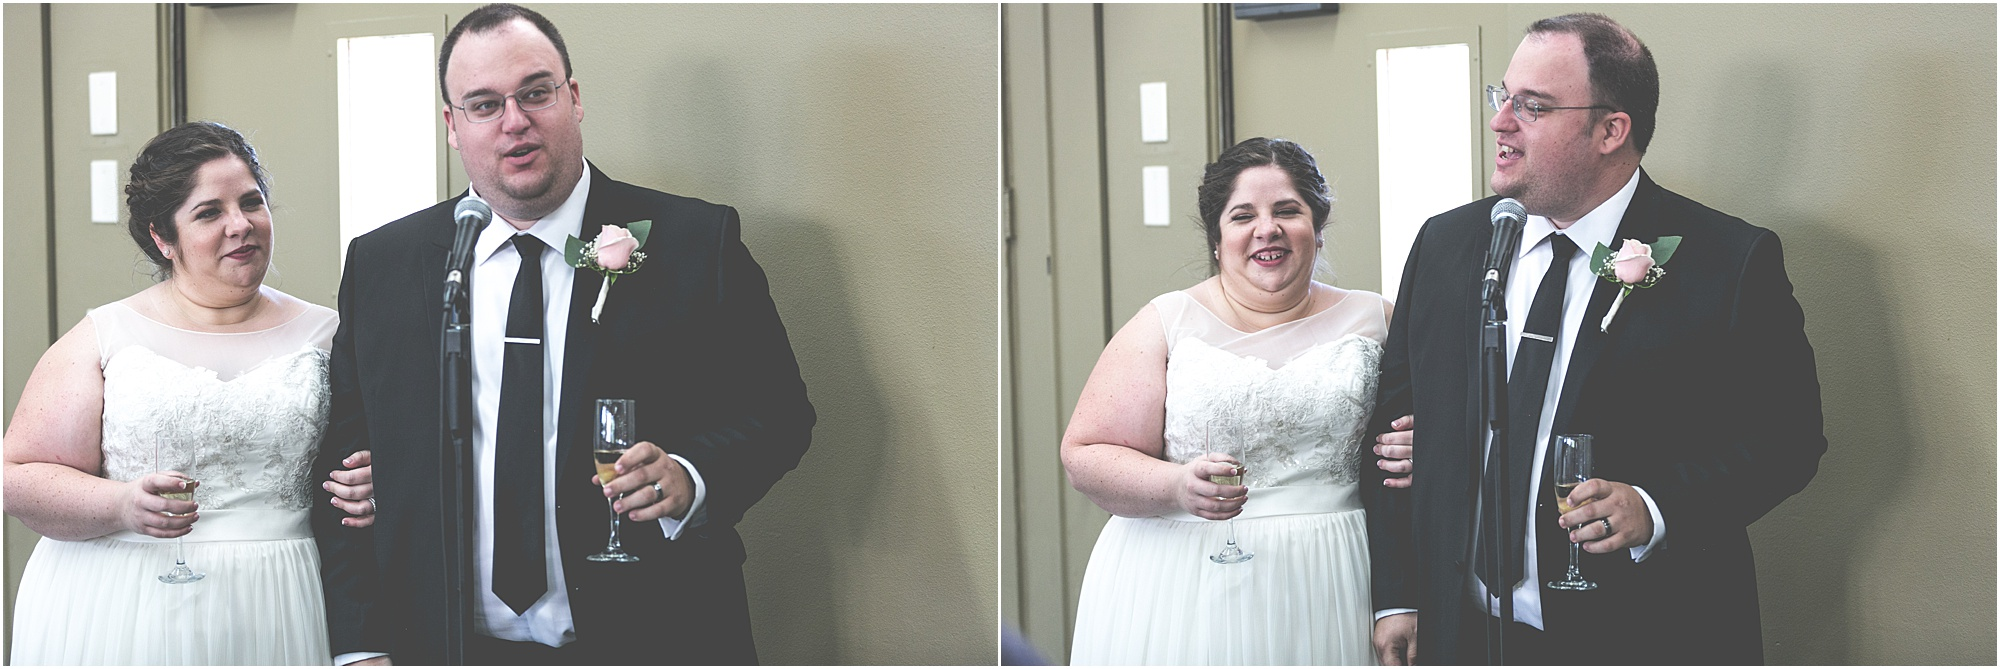 Lindsey & David Wedding Stomps 30.jpg